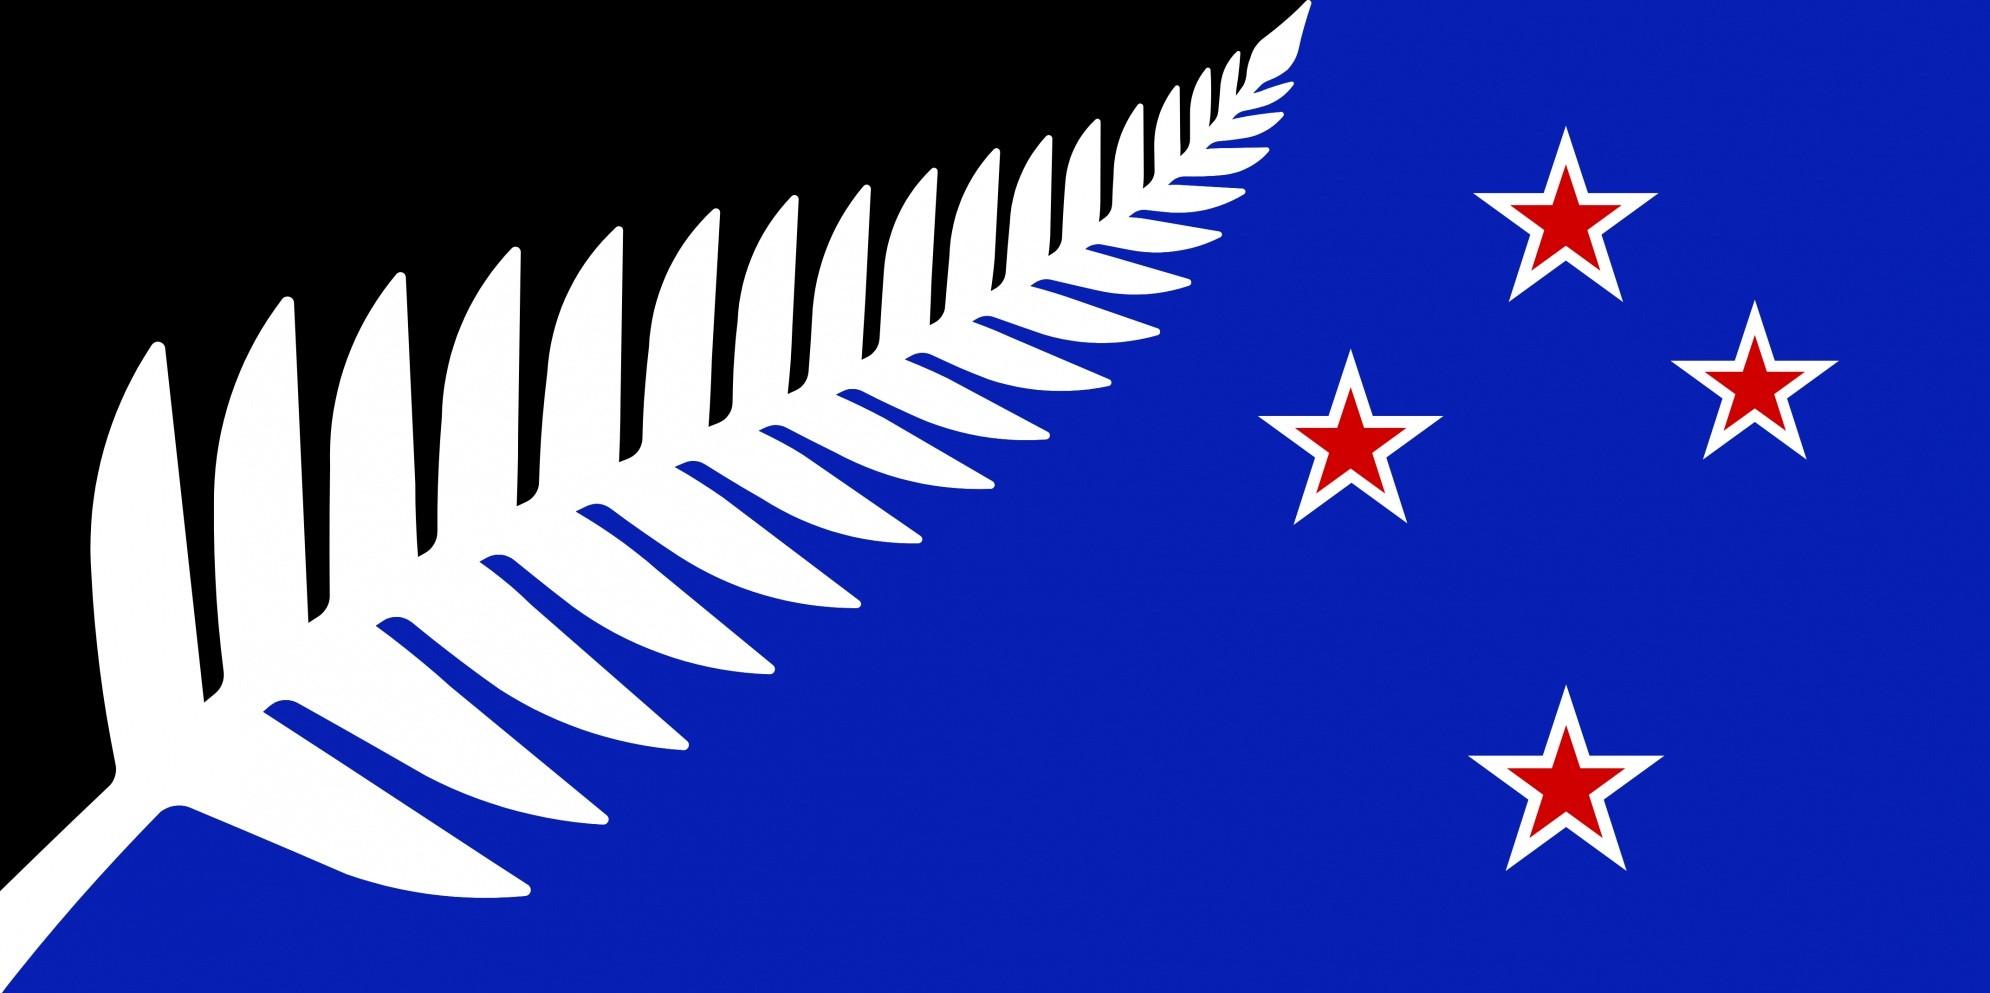 флаг новая зеландия (альтернативный) / govt.nz